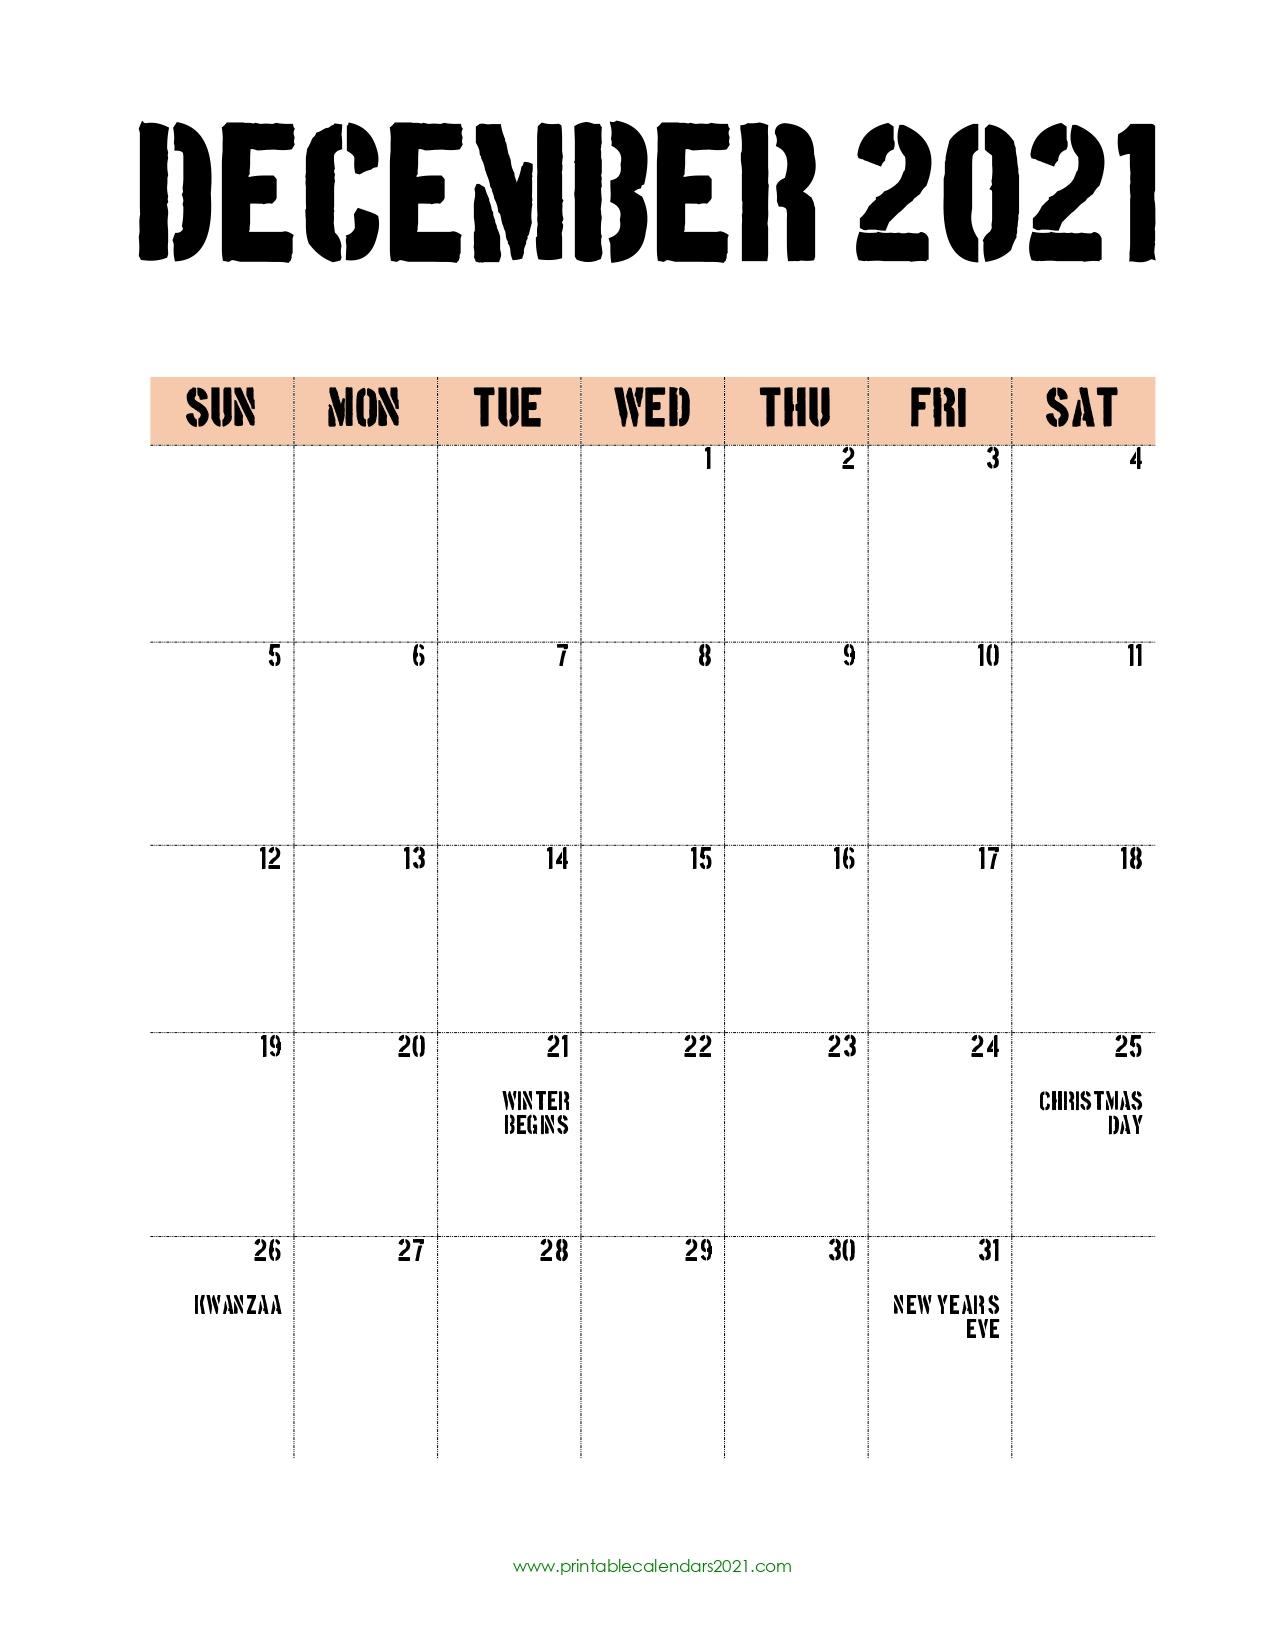 40+ December 2021 Calendar Printable, December 2021 Calendar Pdf